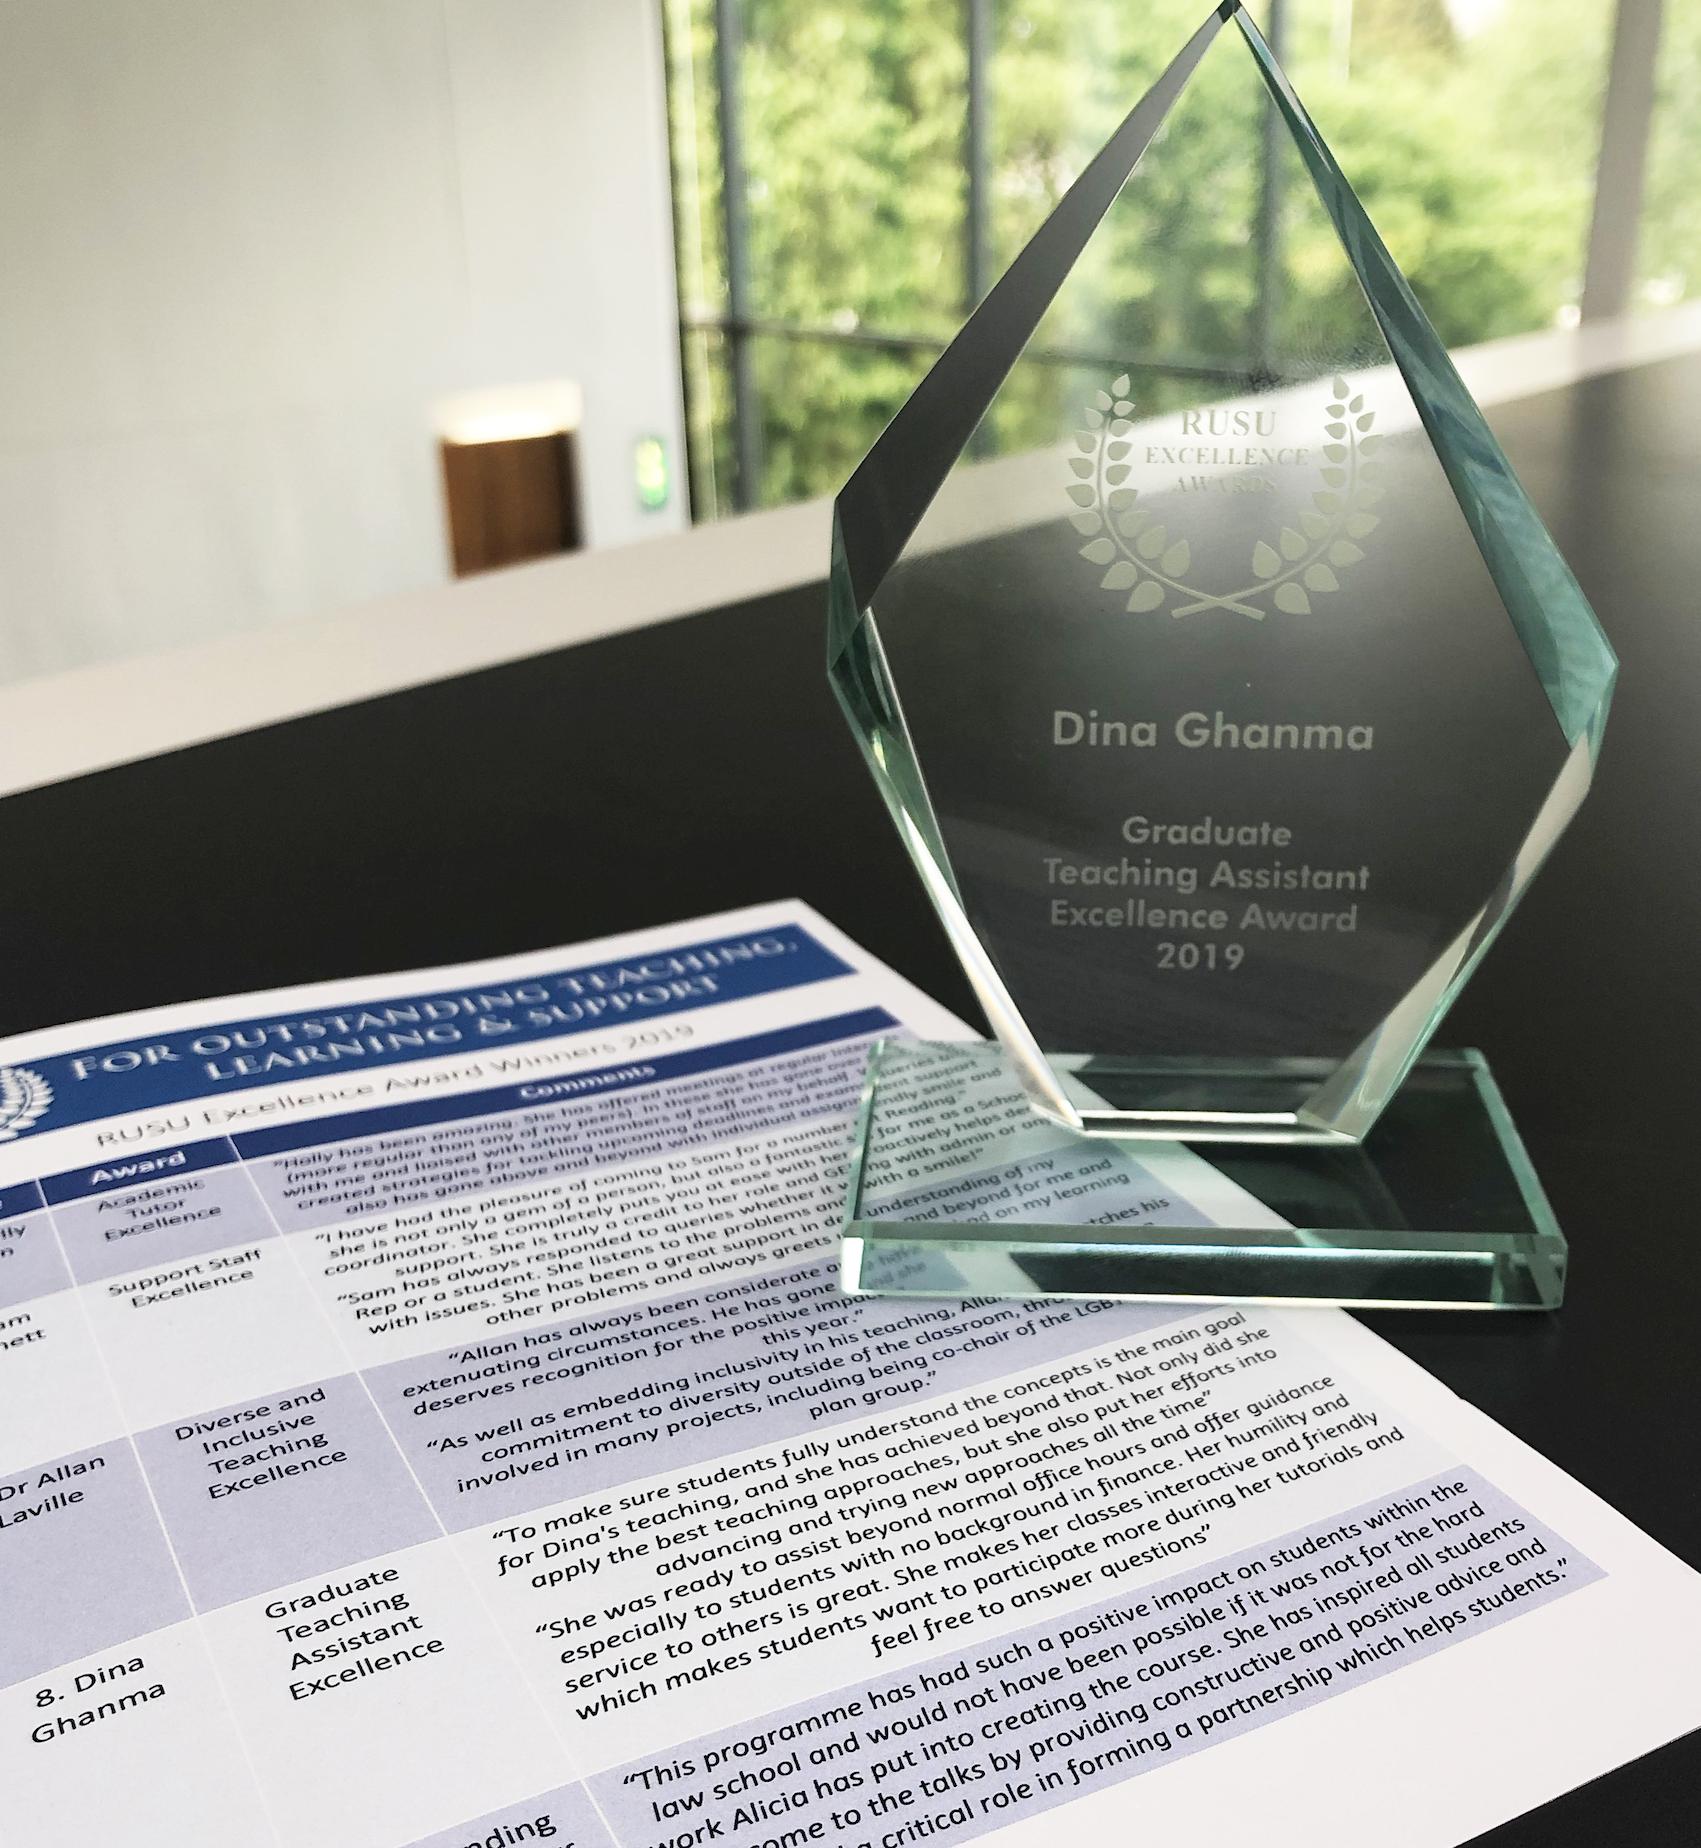 Winner of the RUSU Excellence Award